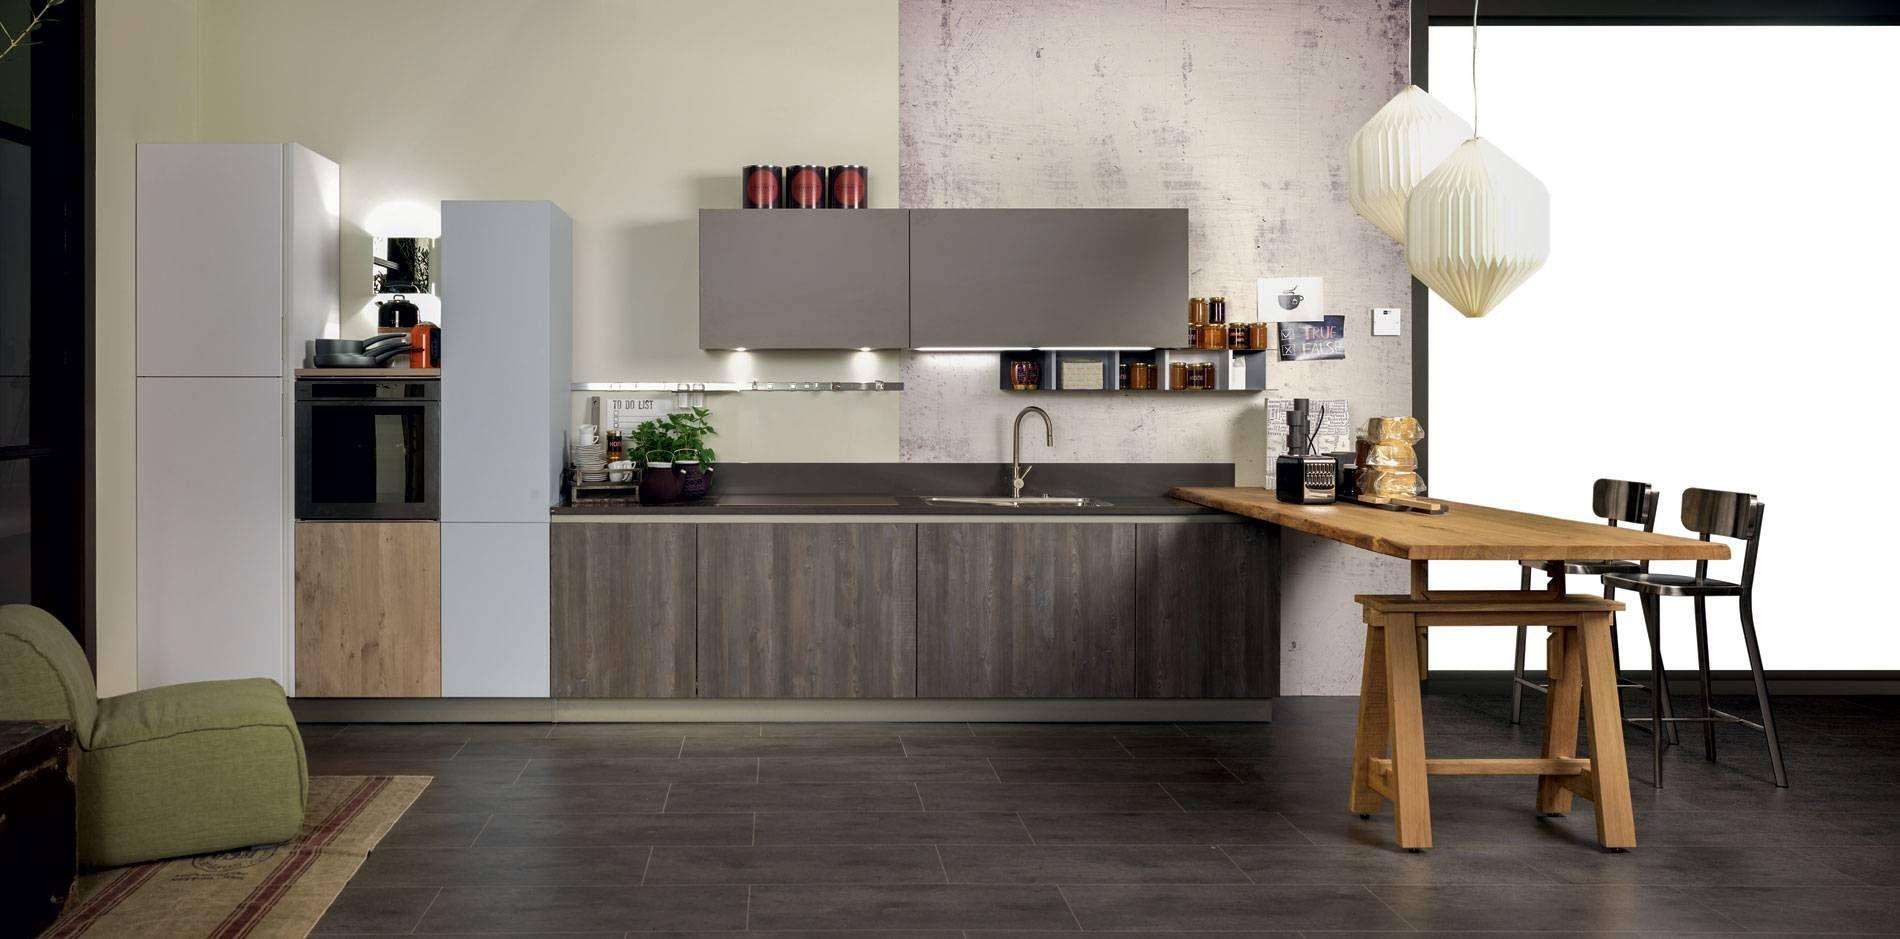 Maya La Nuova Proposta Di Stosa Cucine Www Italianfurnitureavenue Com Kitchen Decor Kitchen Design Home Furniture